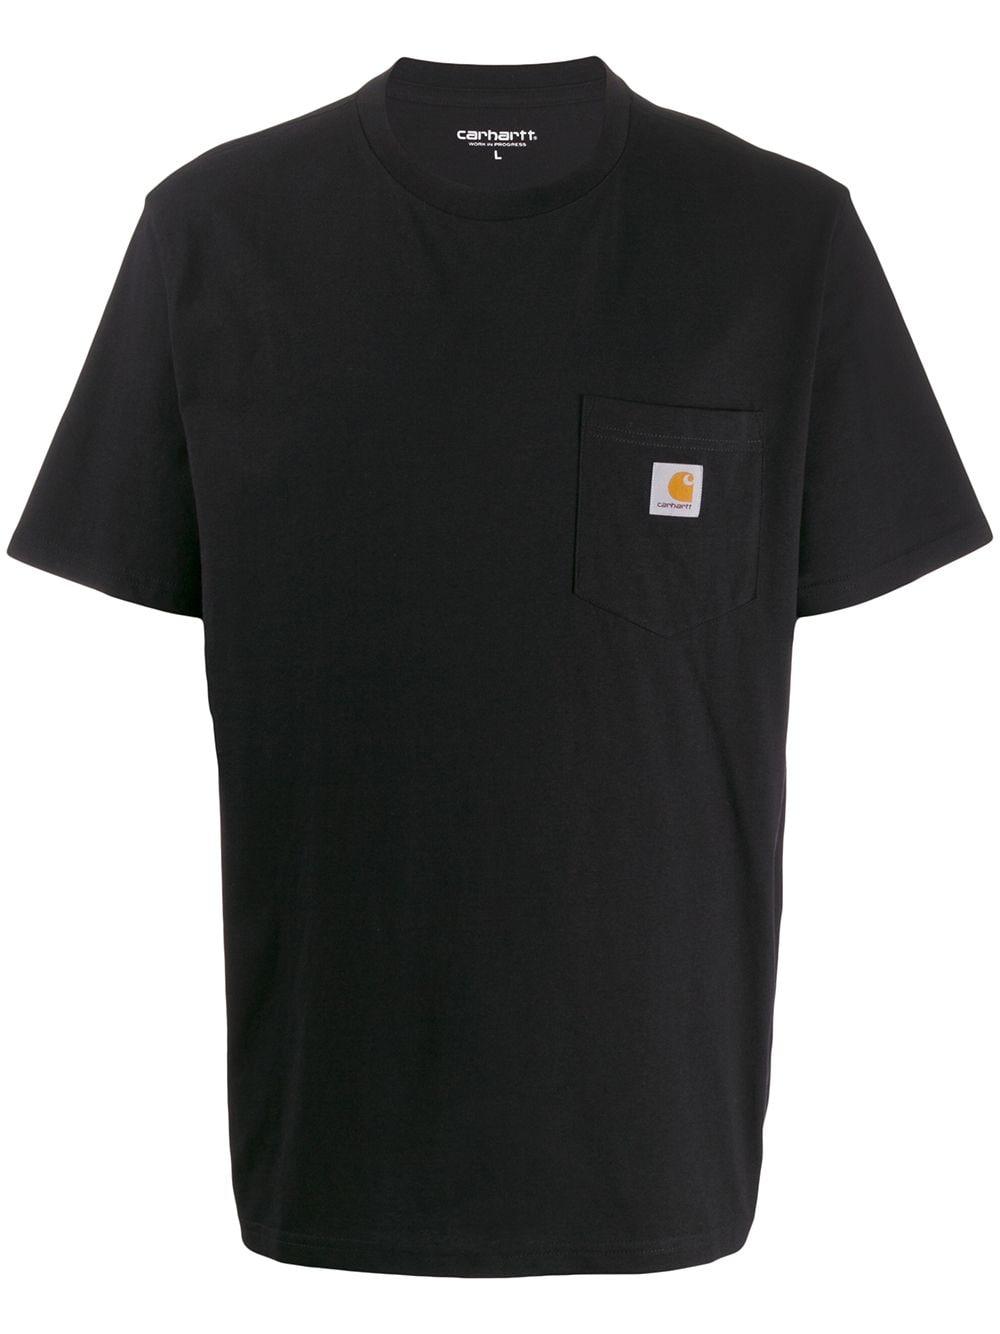 POCKET T-SHIRT CARHARTT WIP | T-shirts | I02209189.00